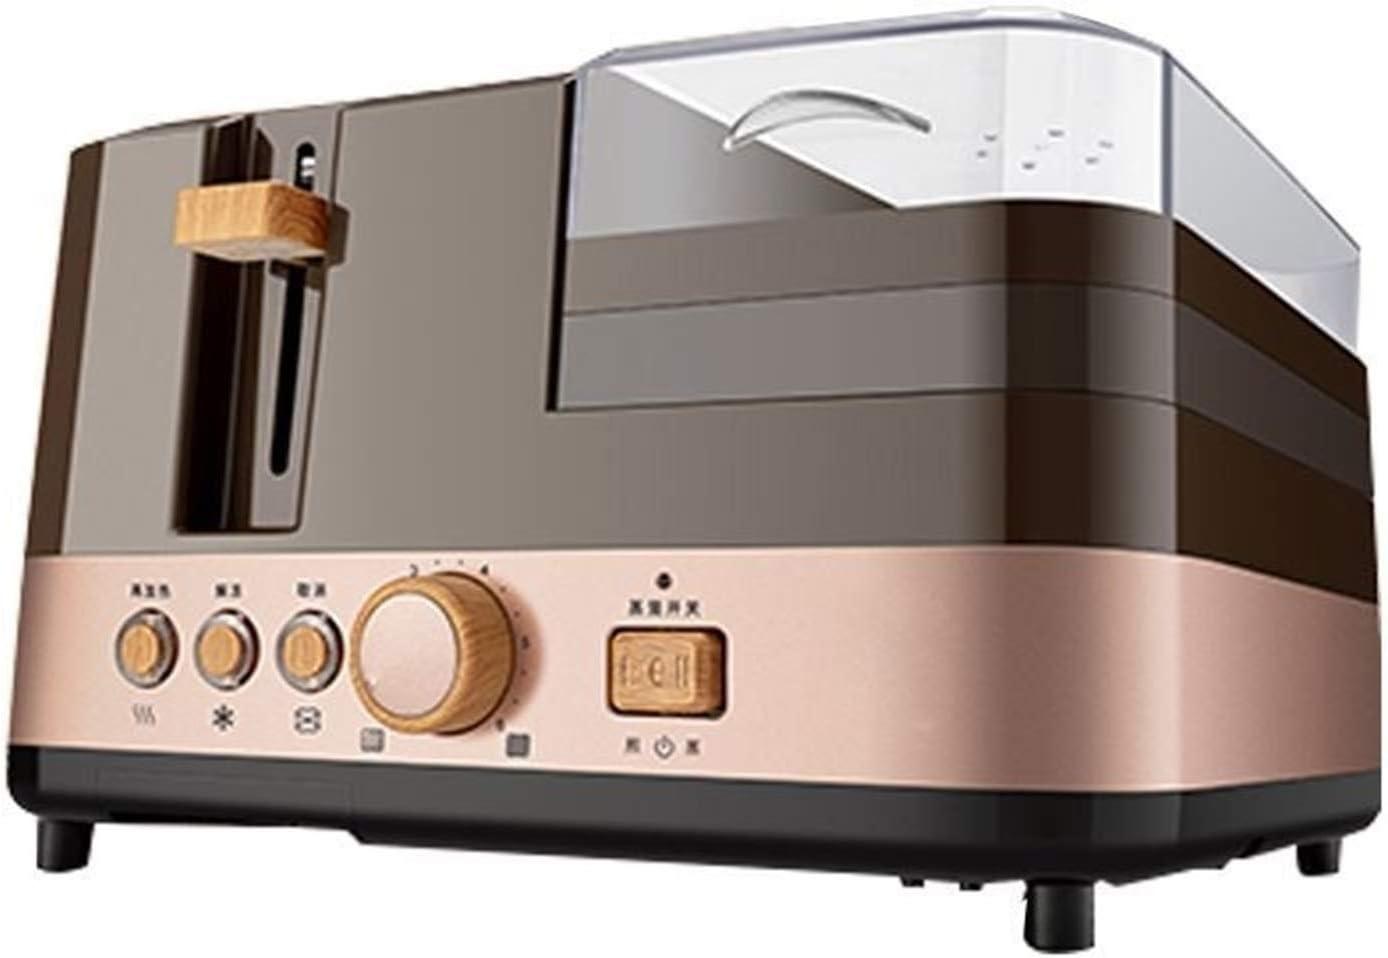 Toaster 4 In 1 Multifunction Electric Breakfast Machine Toaster Sandwich Machine Household Frying Pan Bread Maker Egg Steamer